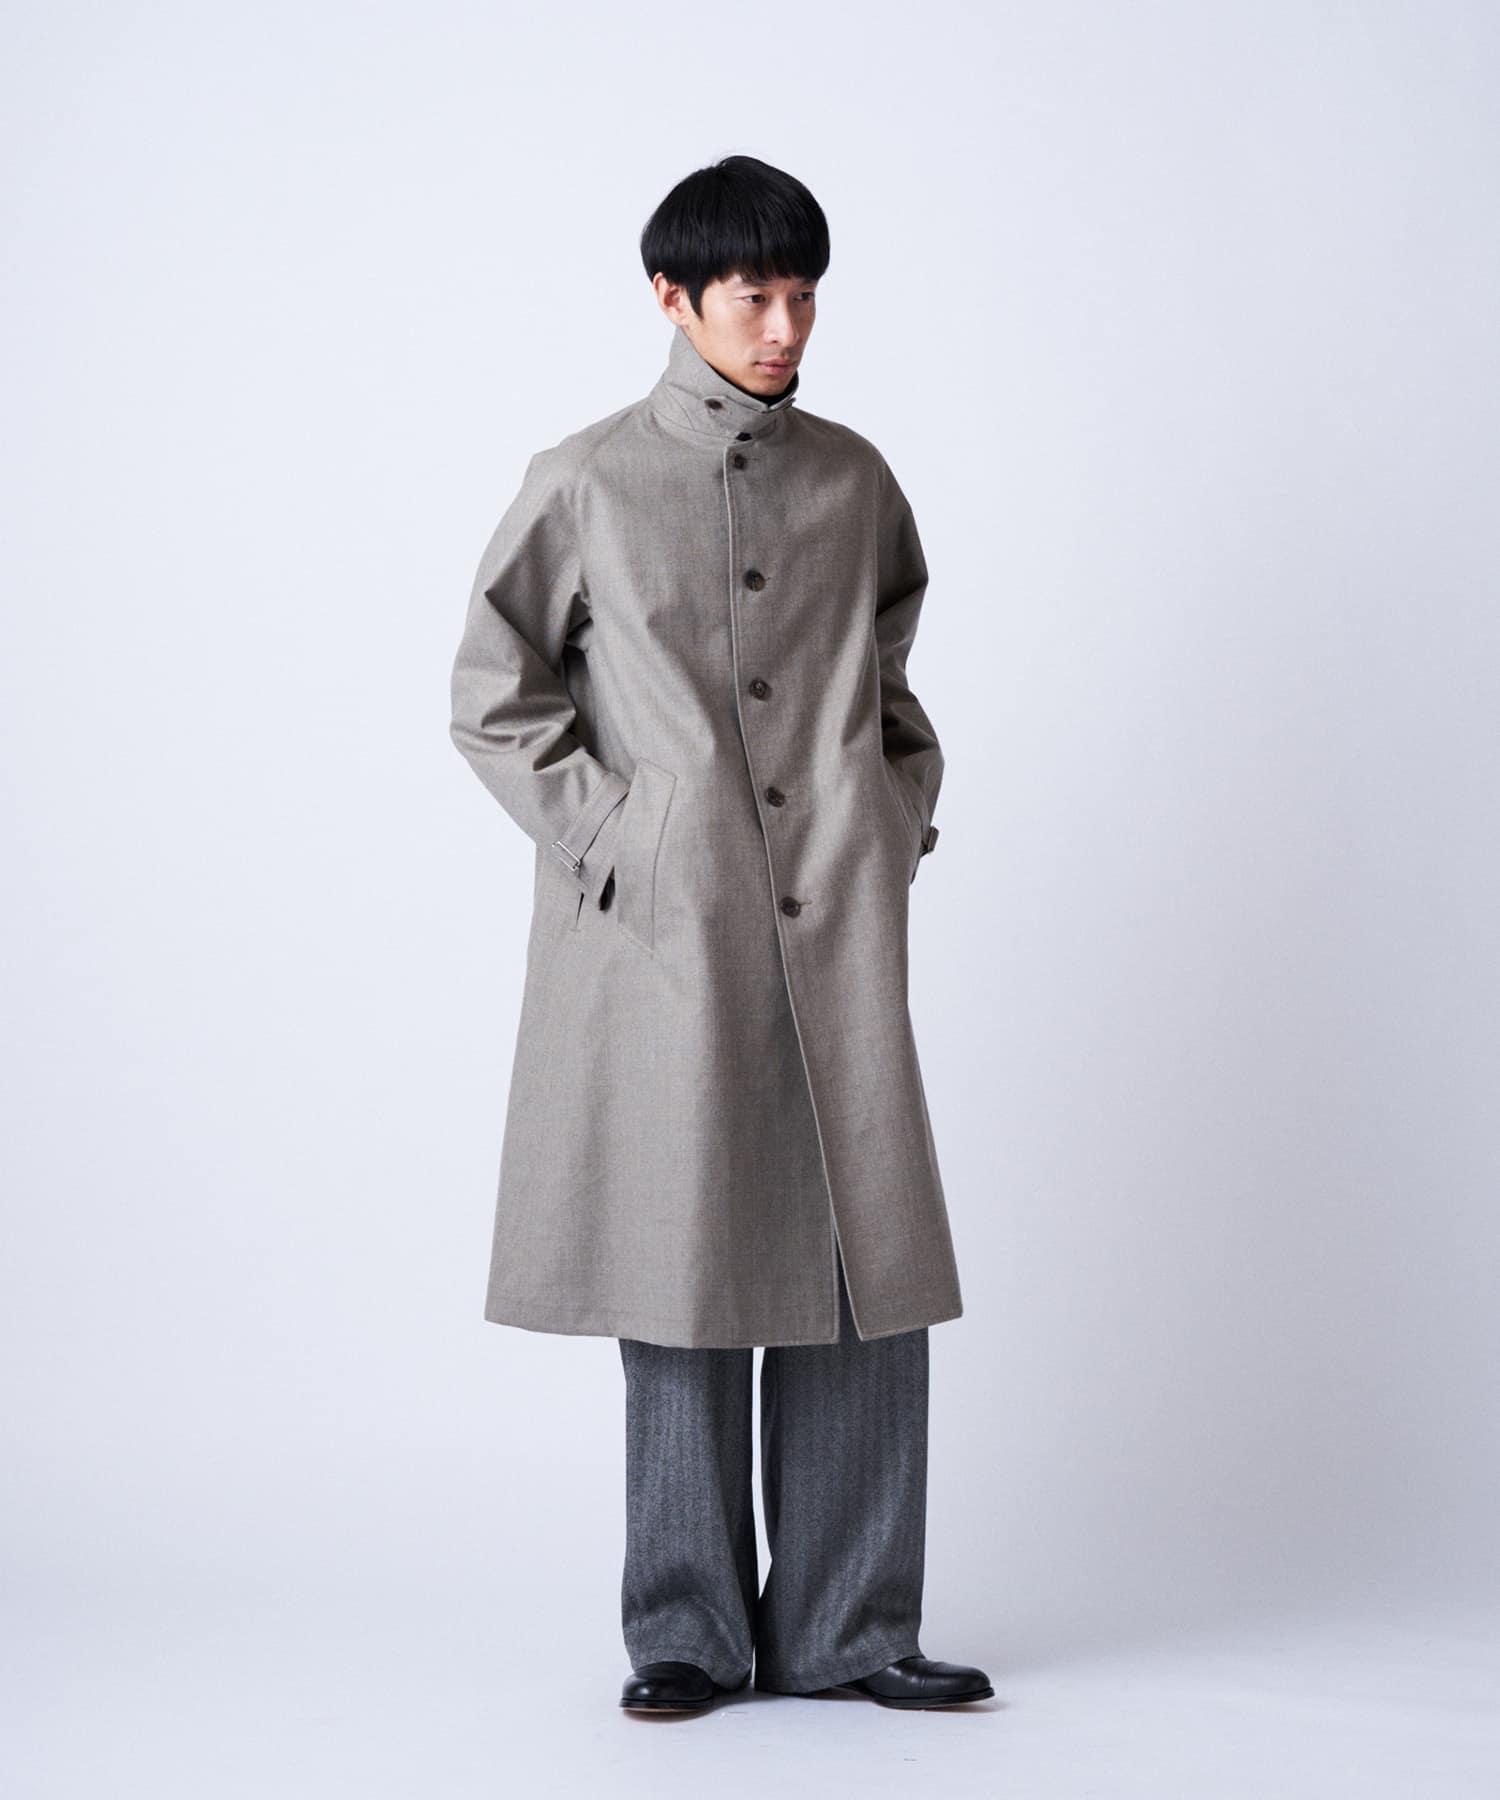 BLOOM&BRANCH(ブルームアンドブランチ) PHLANNÈL SOL /  mens Motorcycle Coat